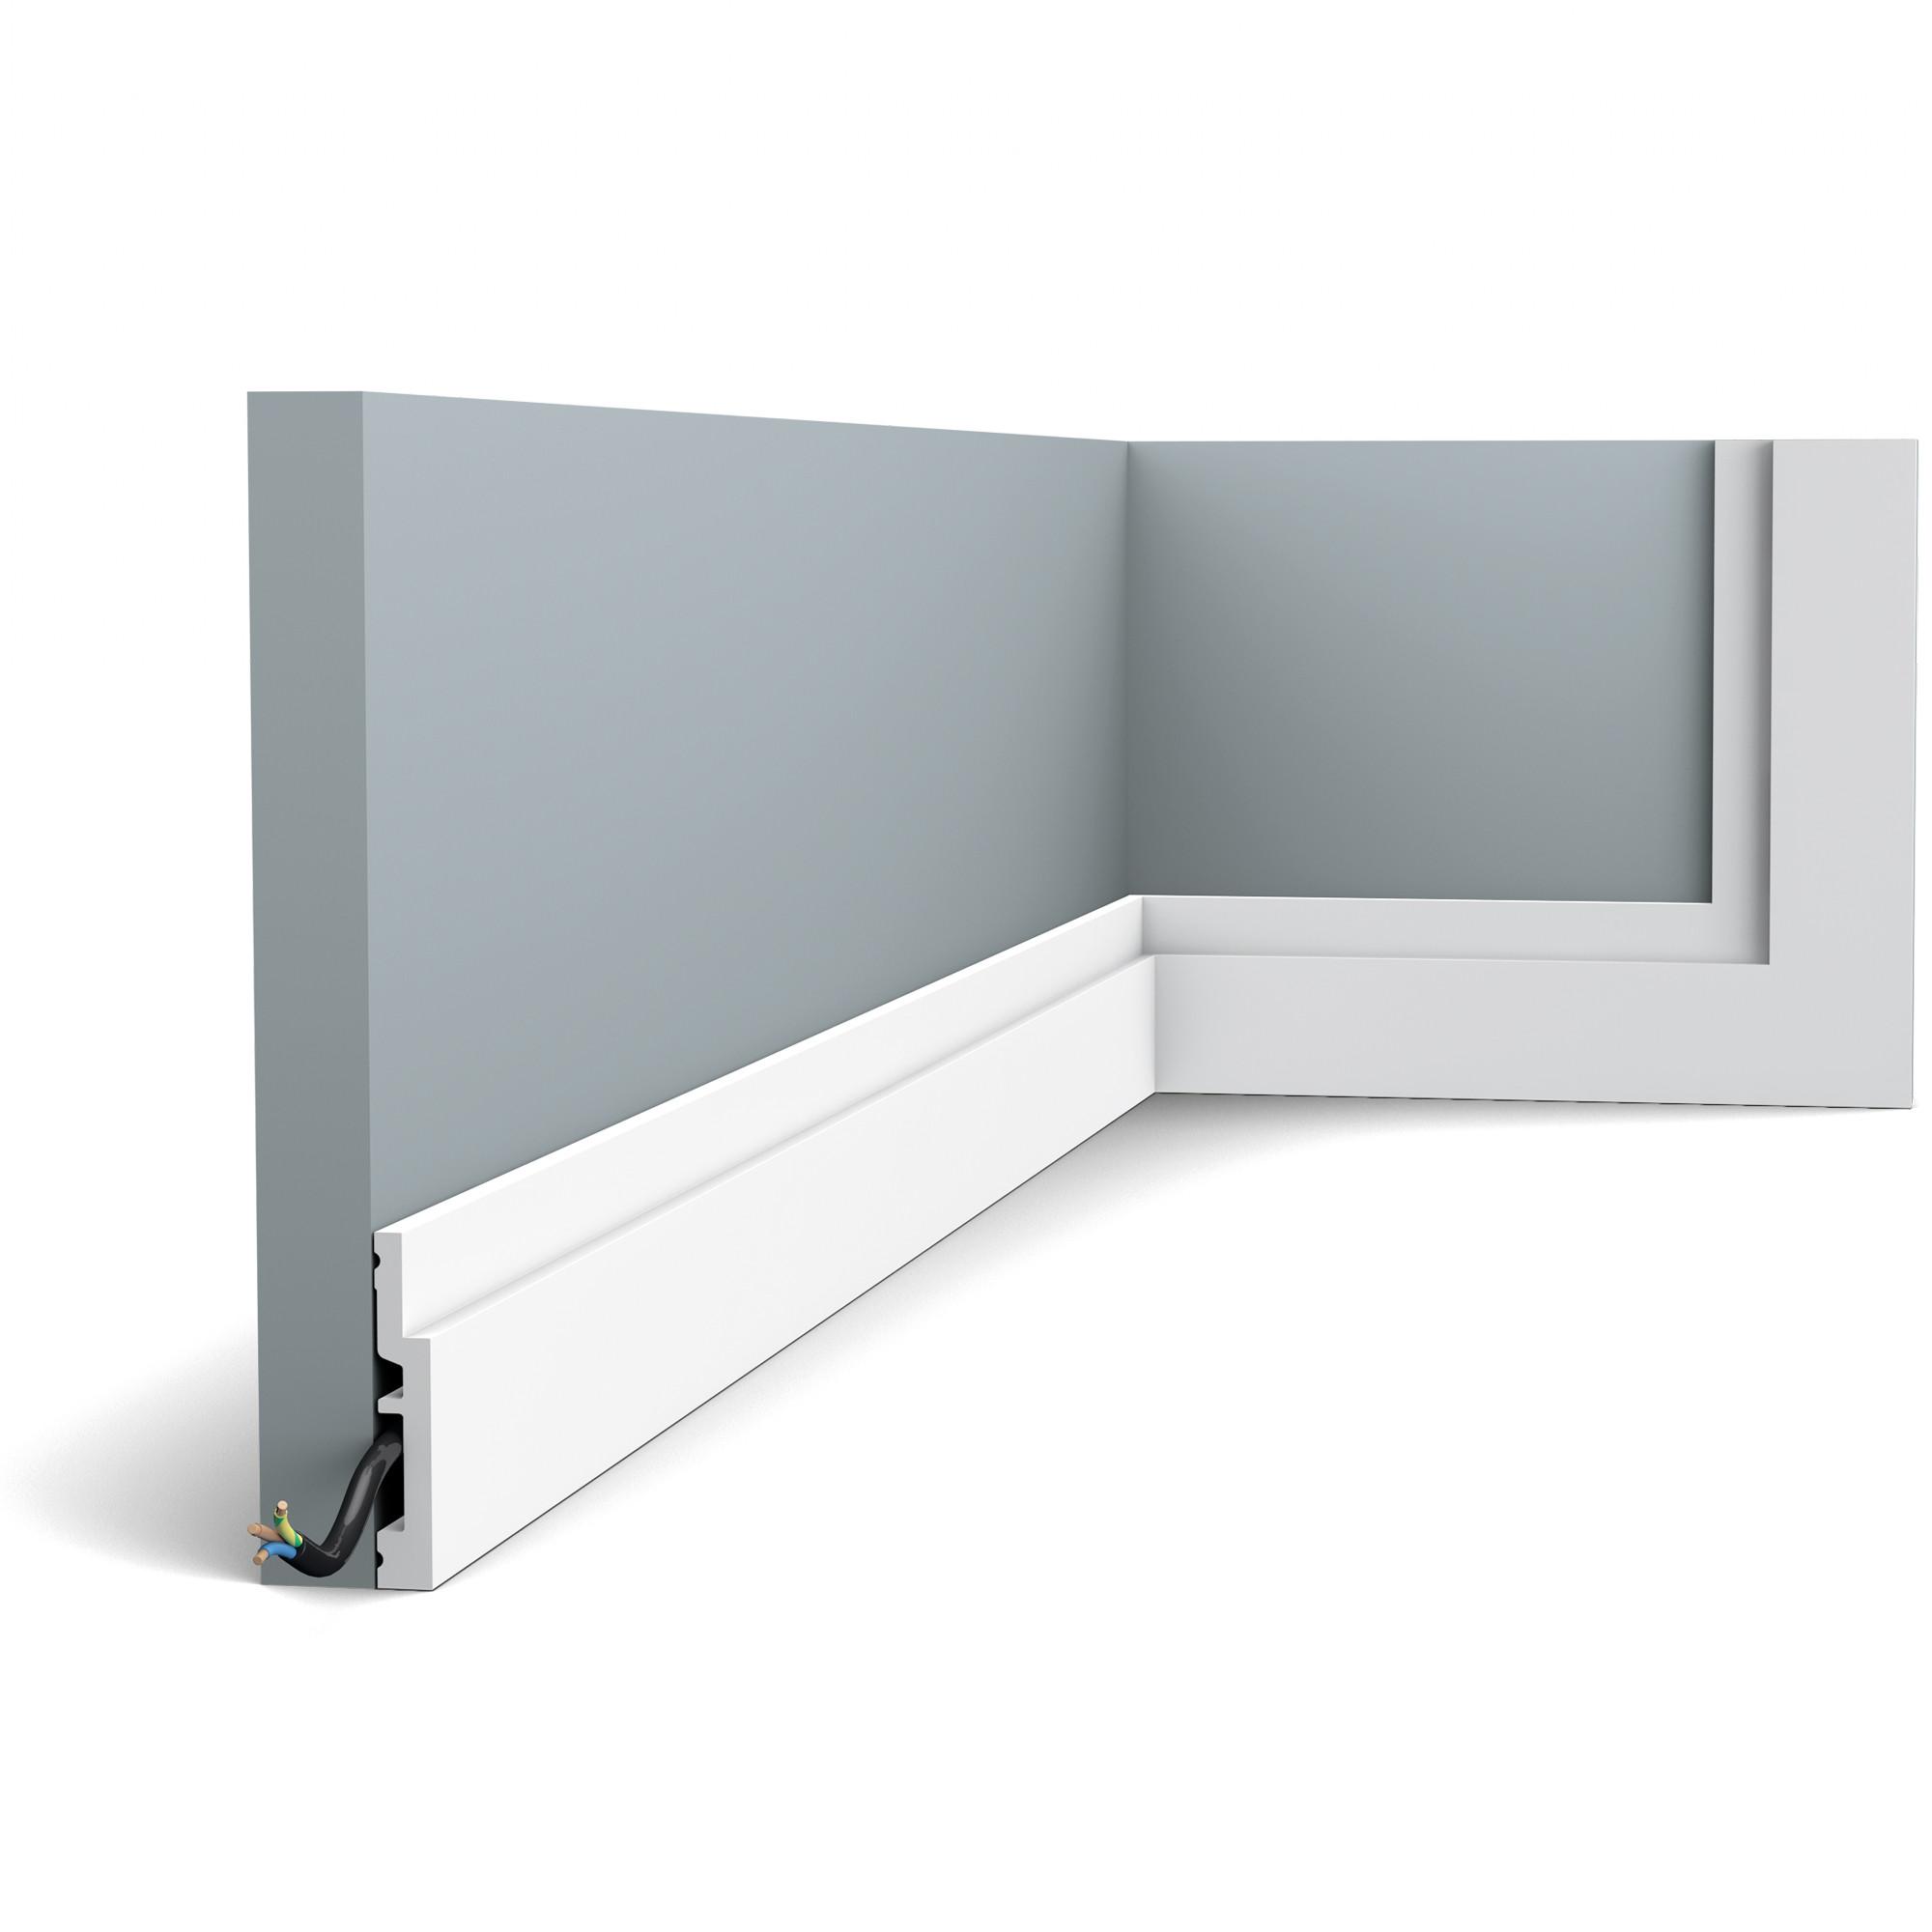 ORAC Decor ORAC stropní a podlahová lišta SX187 - Lišta 12x75x2000 mm